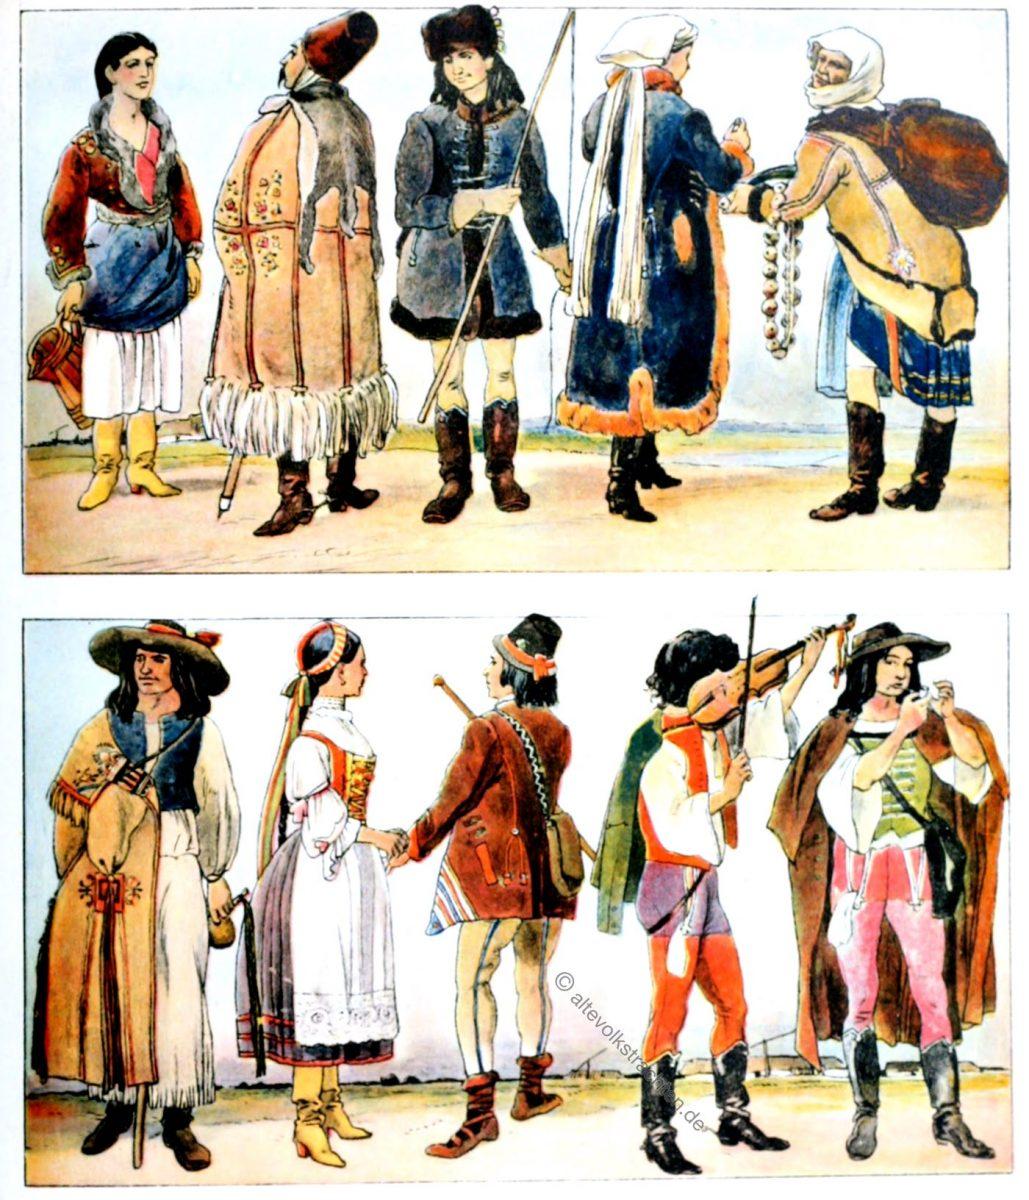 Volkstrachten, Slowakei, Ungarn, Trachten, Kostüme, Adolf Rosenberg, Eduard Heyck, Zigeuner